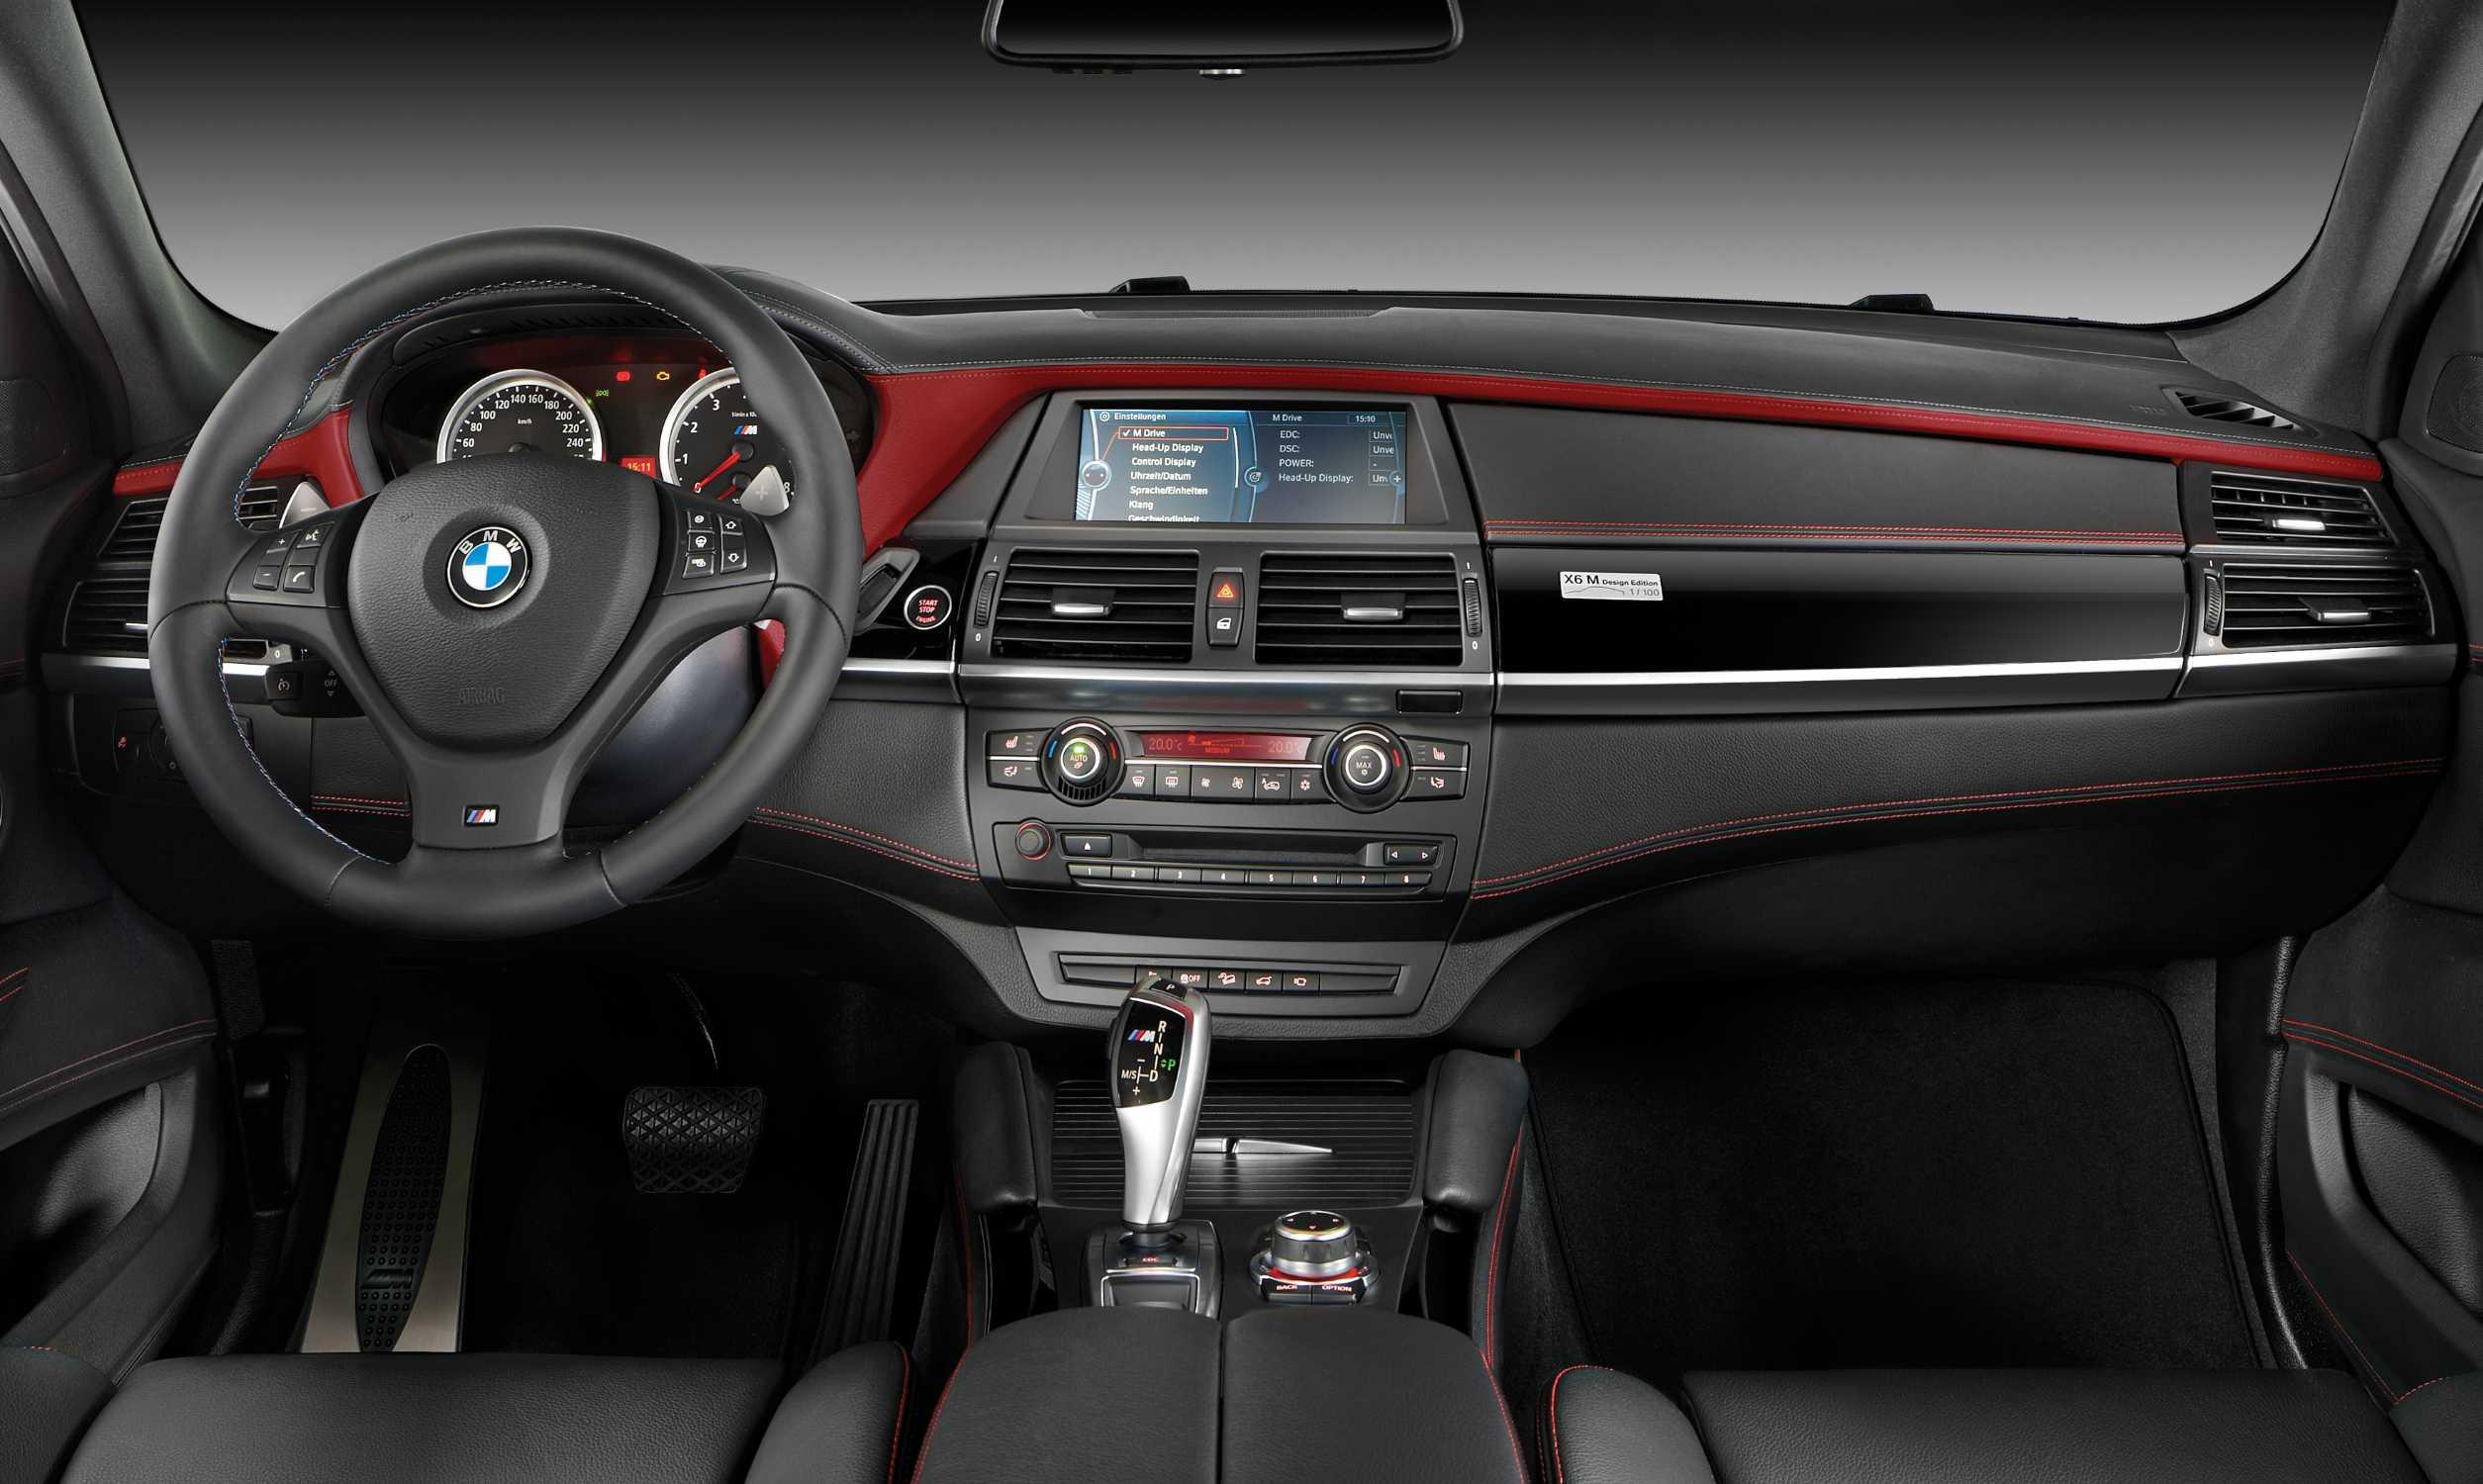 Bmw X6 M Interior Bmw Individual Full Merino Leather Black